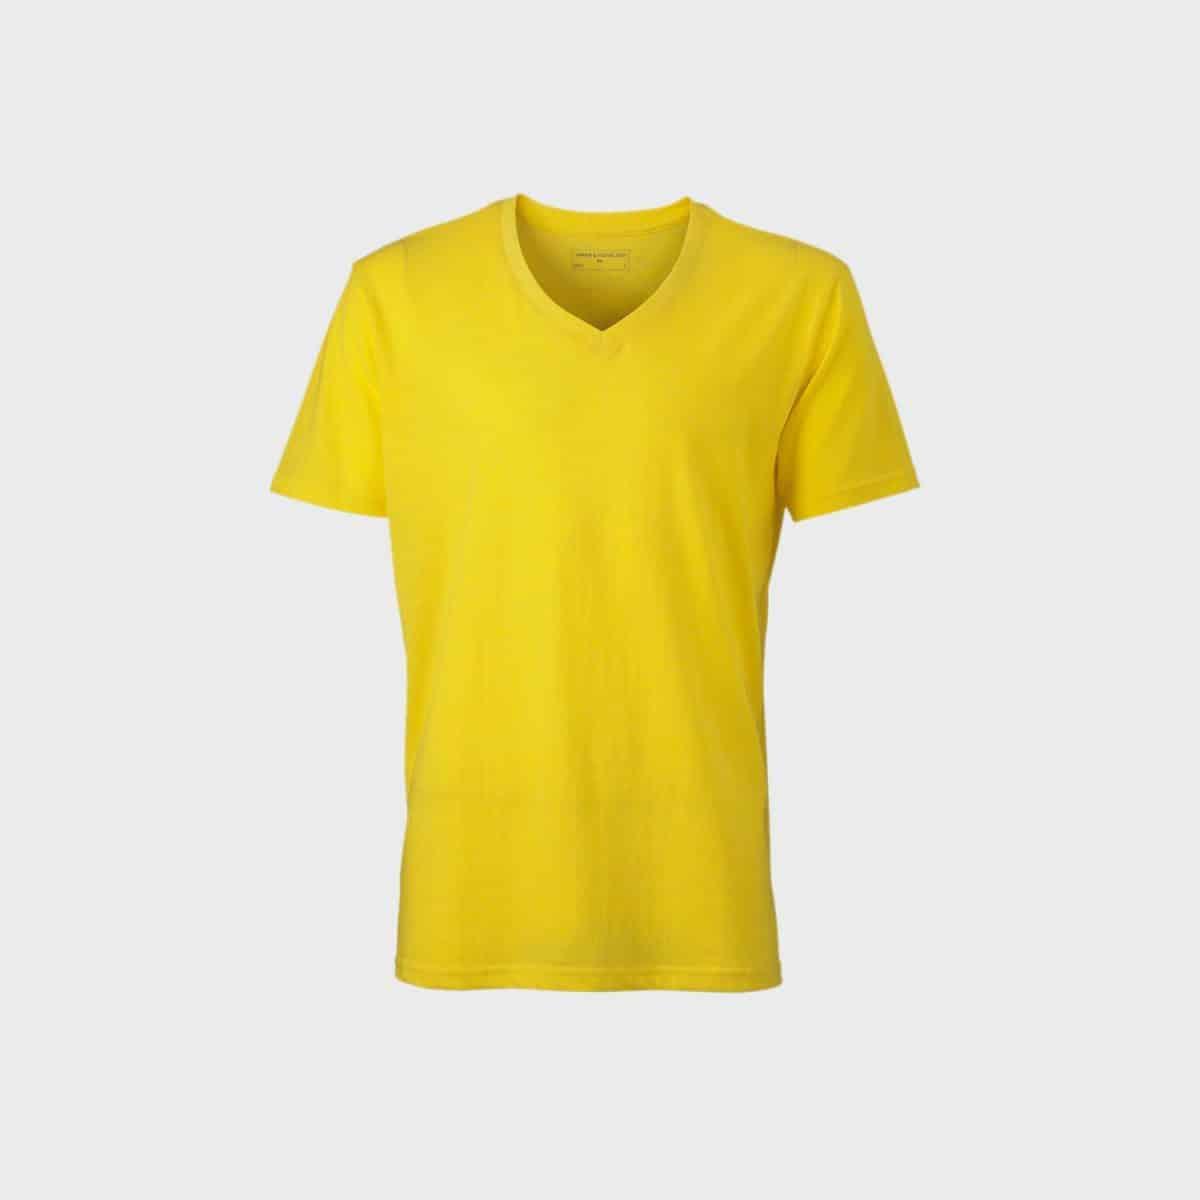 Daiber T Shirts JN974 Yellowmelange Front